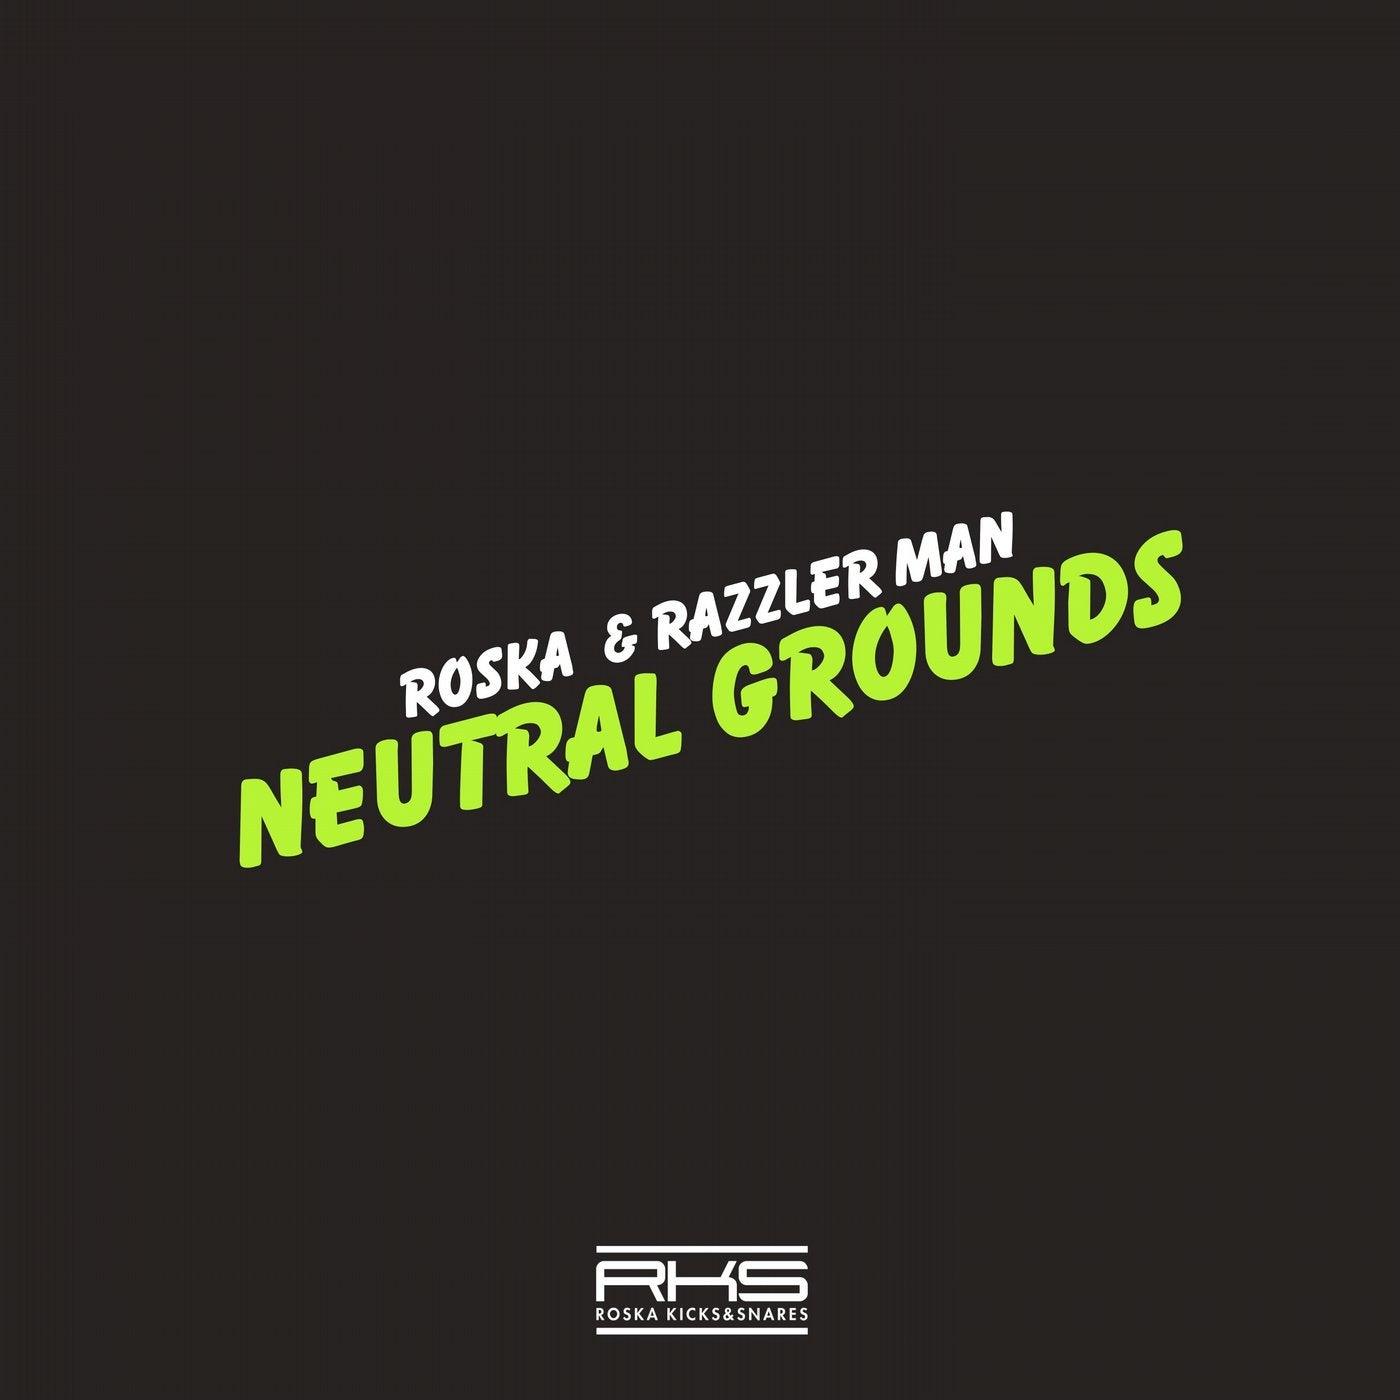 Neutral Grounds (Original Mix)